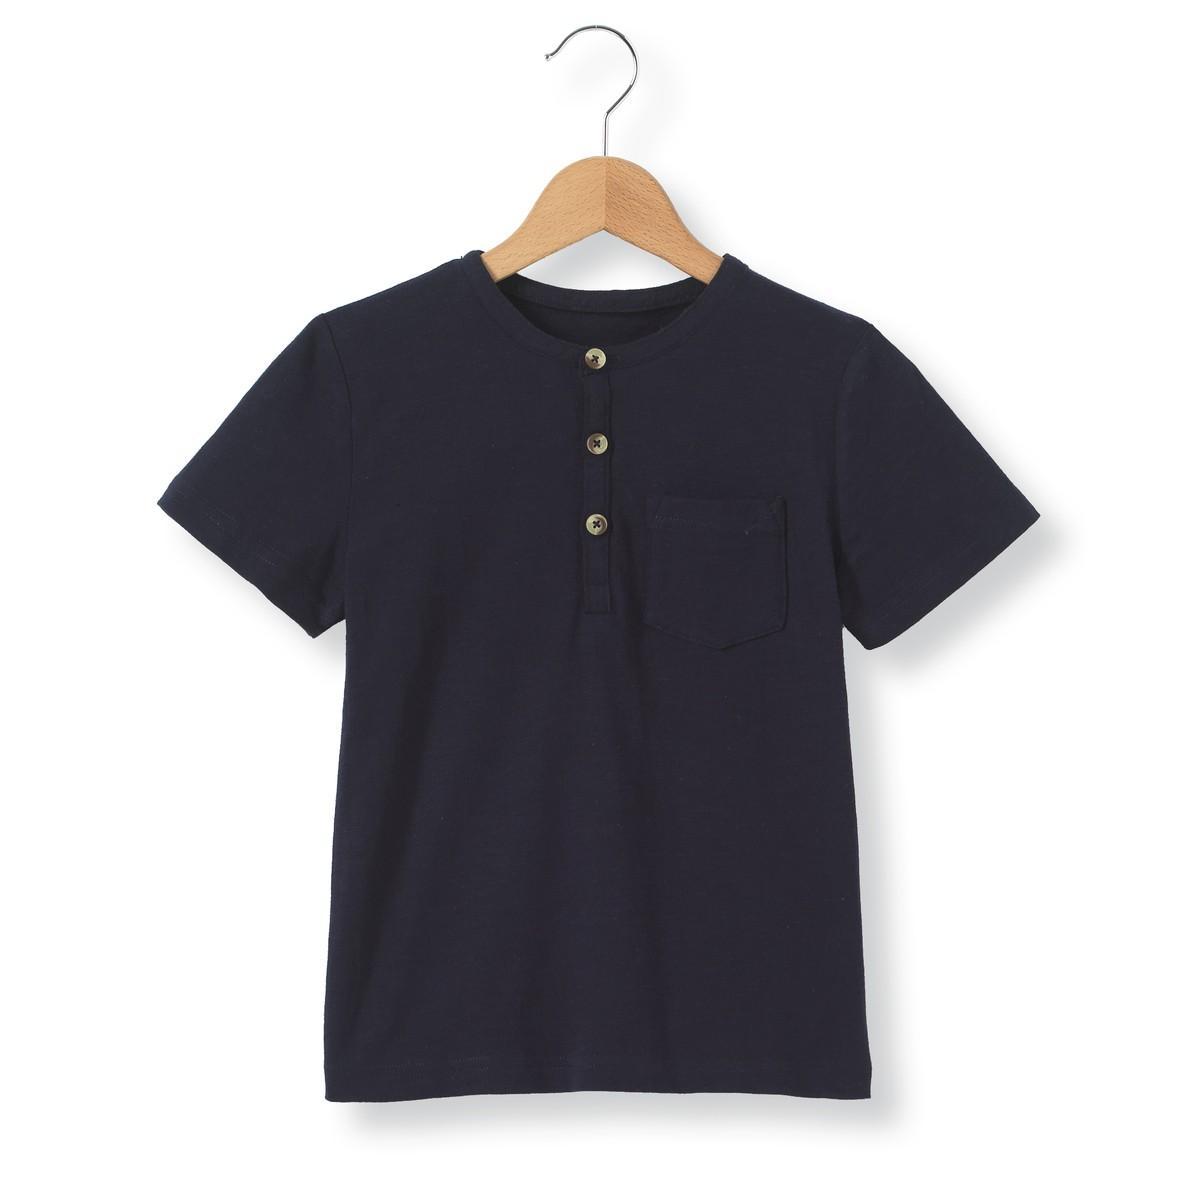 8e39415f72f Lyst - La Redoute T-shirt Col Tunisien 3-12 Ans in Blue for Men